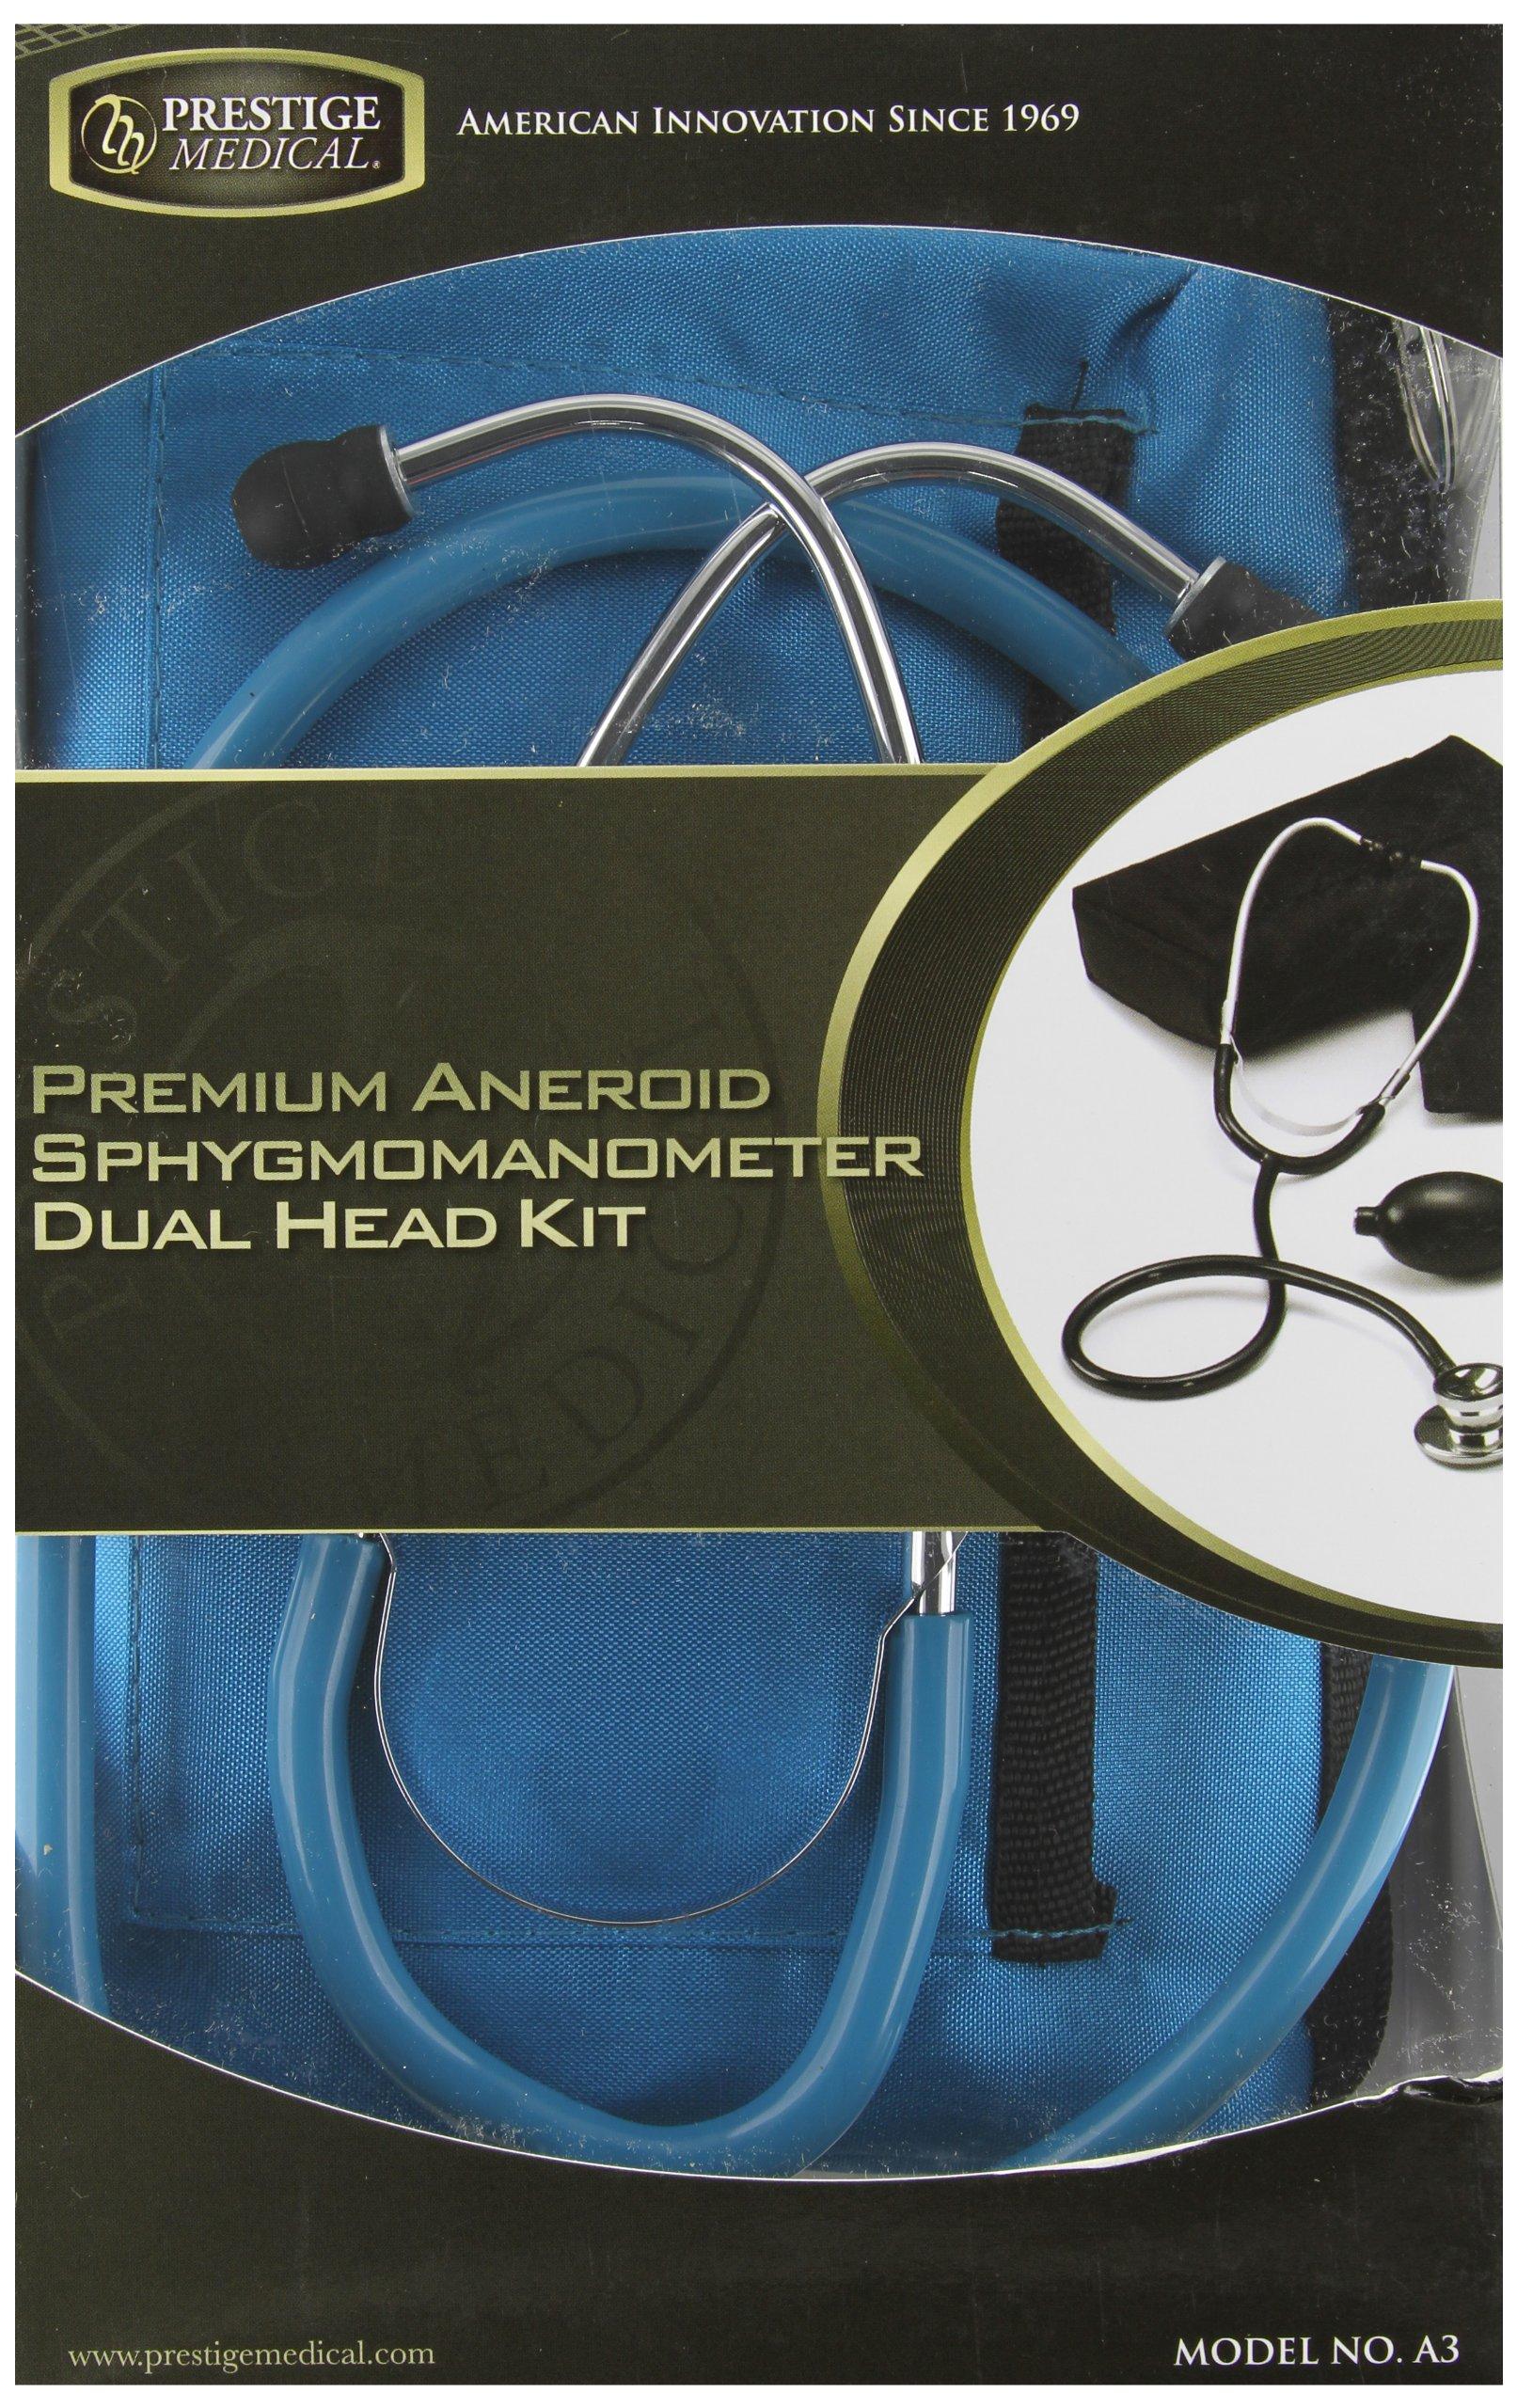 Prestige Medical Premium Aneroid Sphygmomanometer Dualhead Kit, Teal